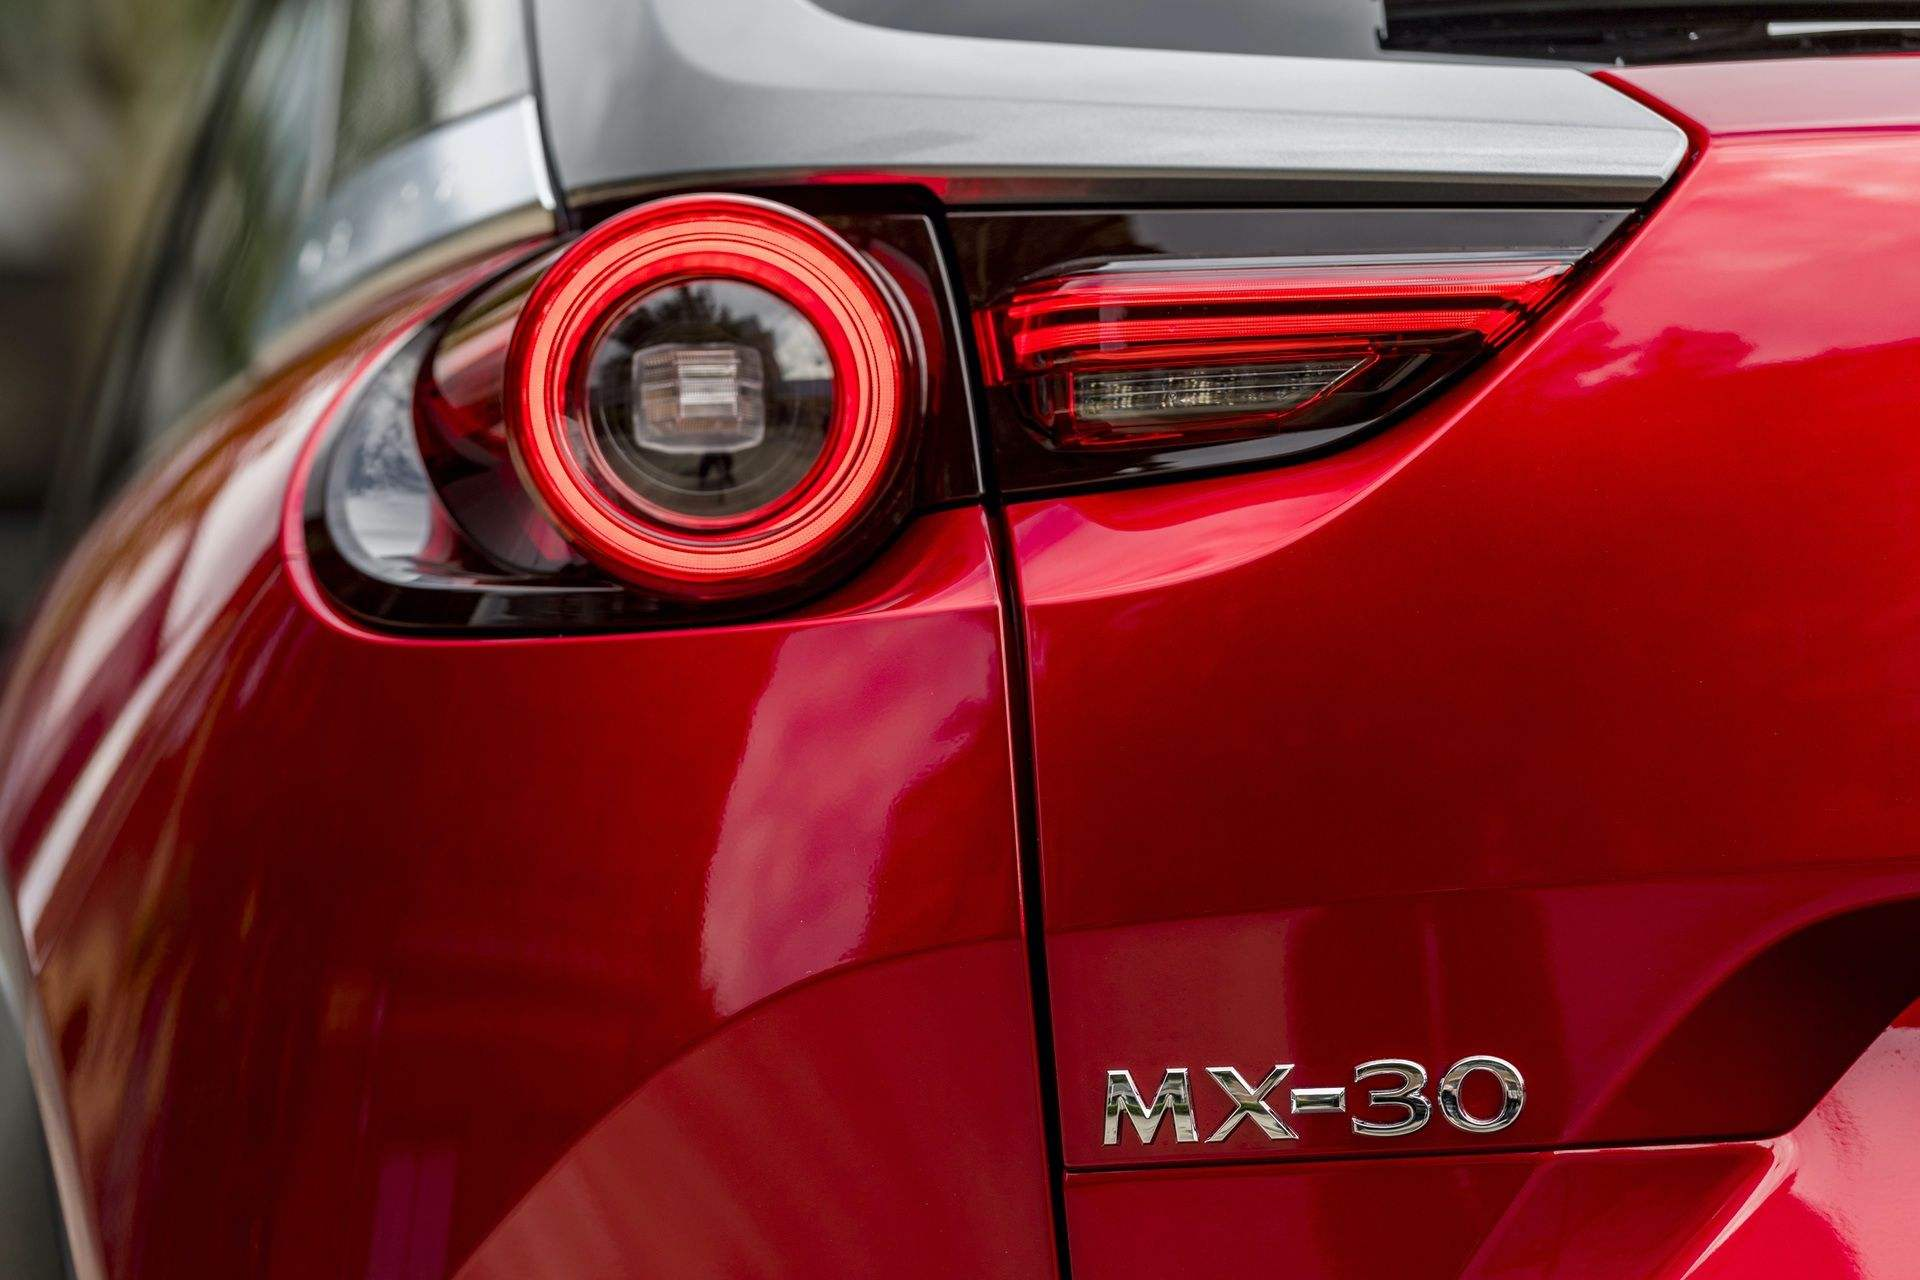 Mazda_MX-30_launch_0023